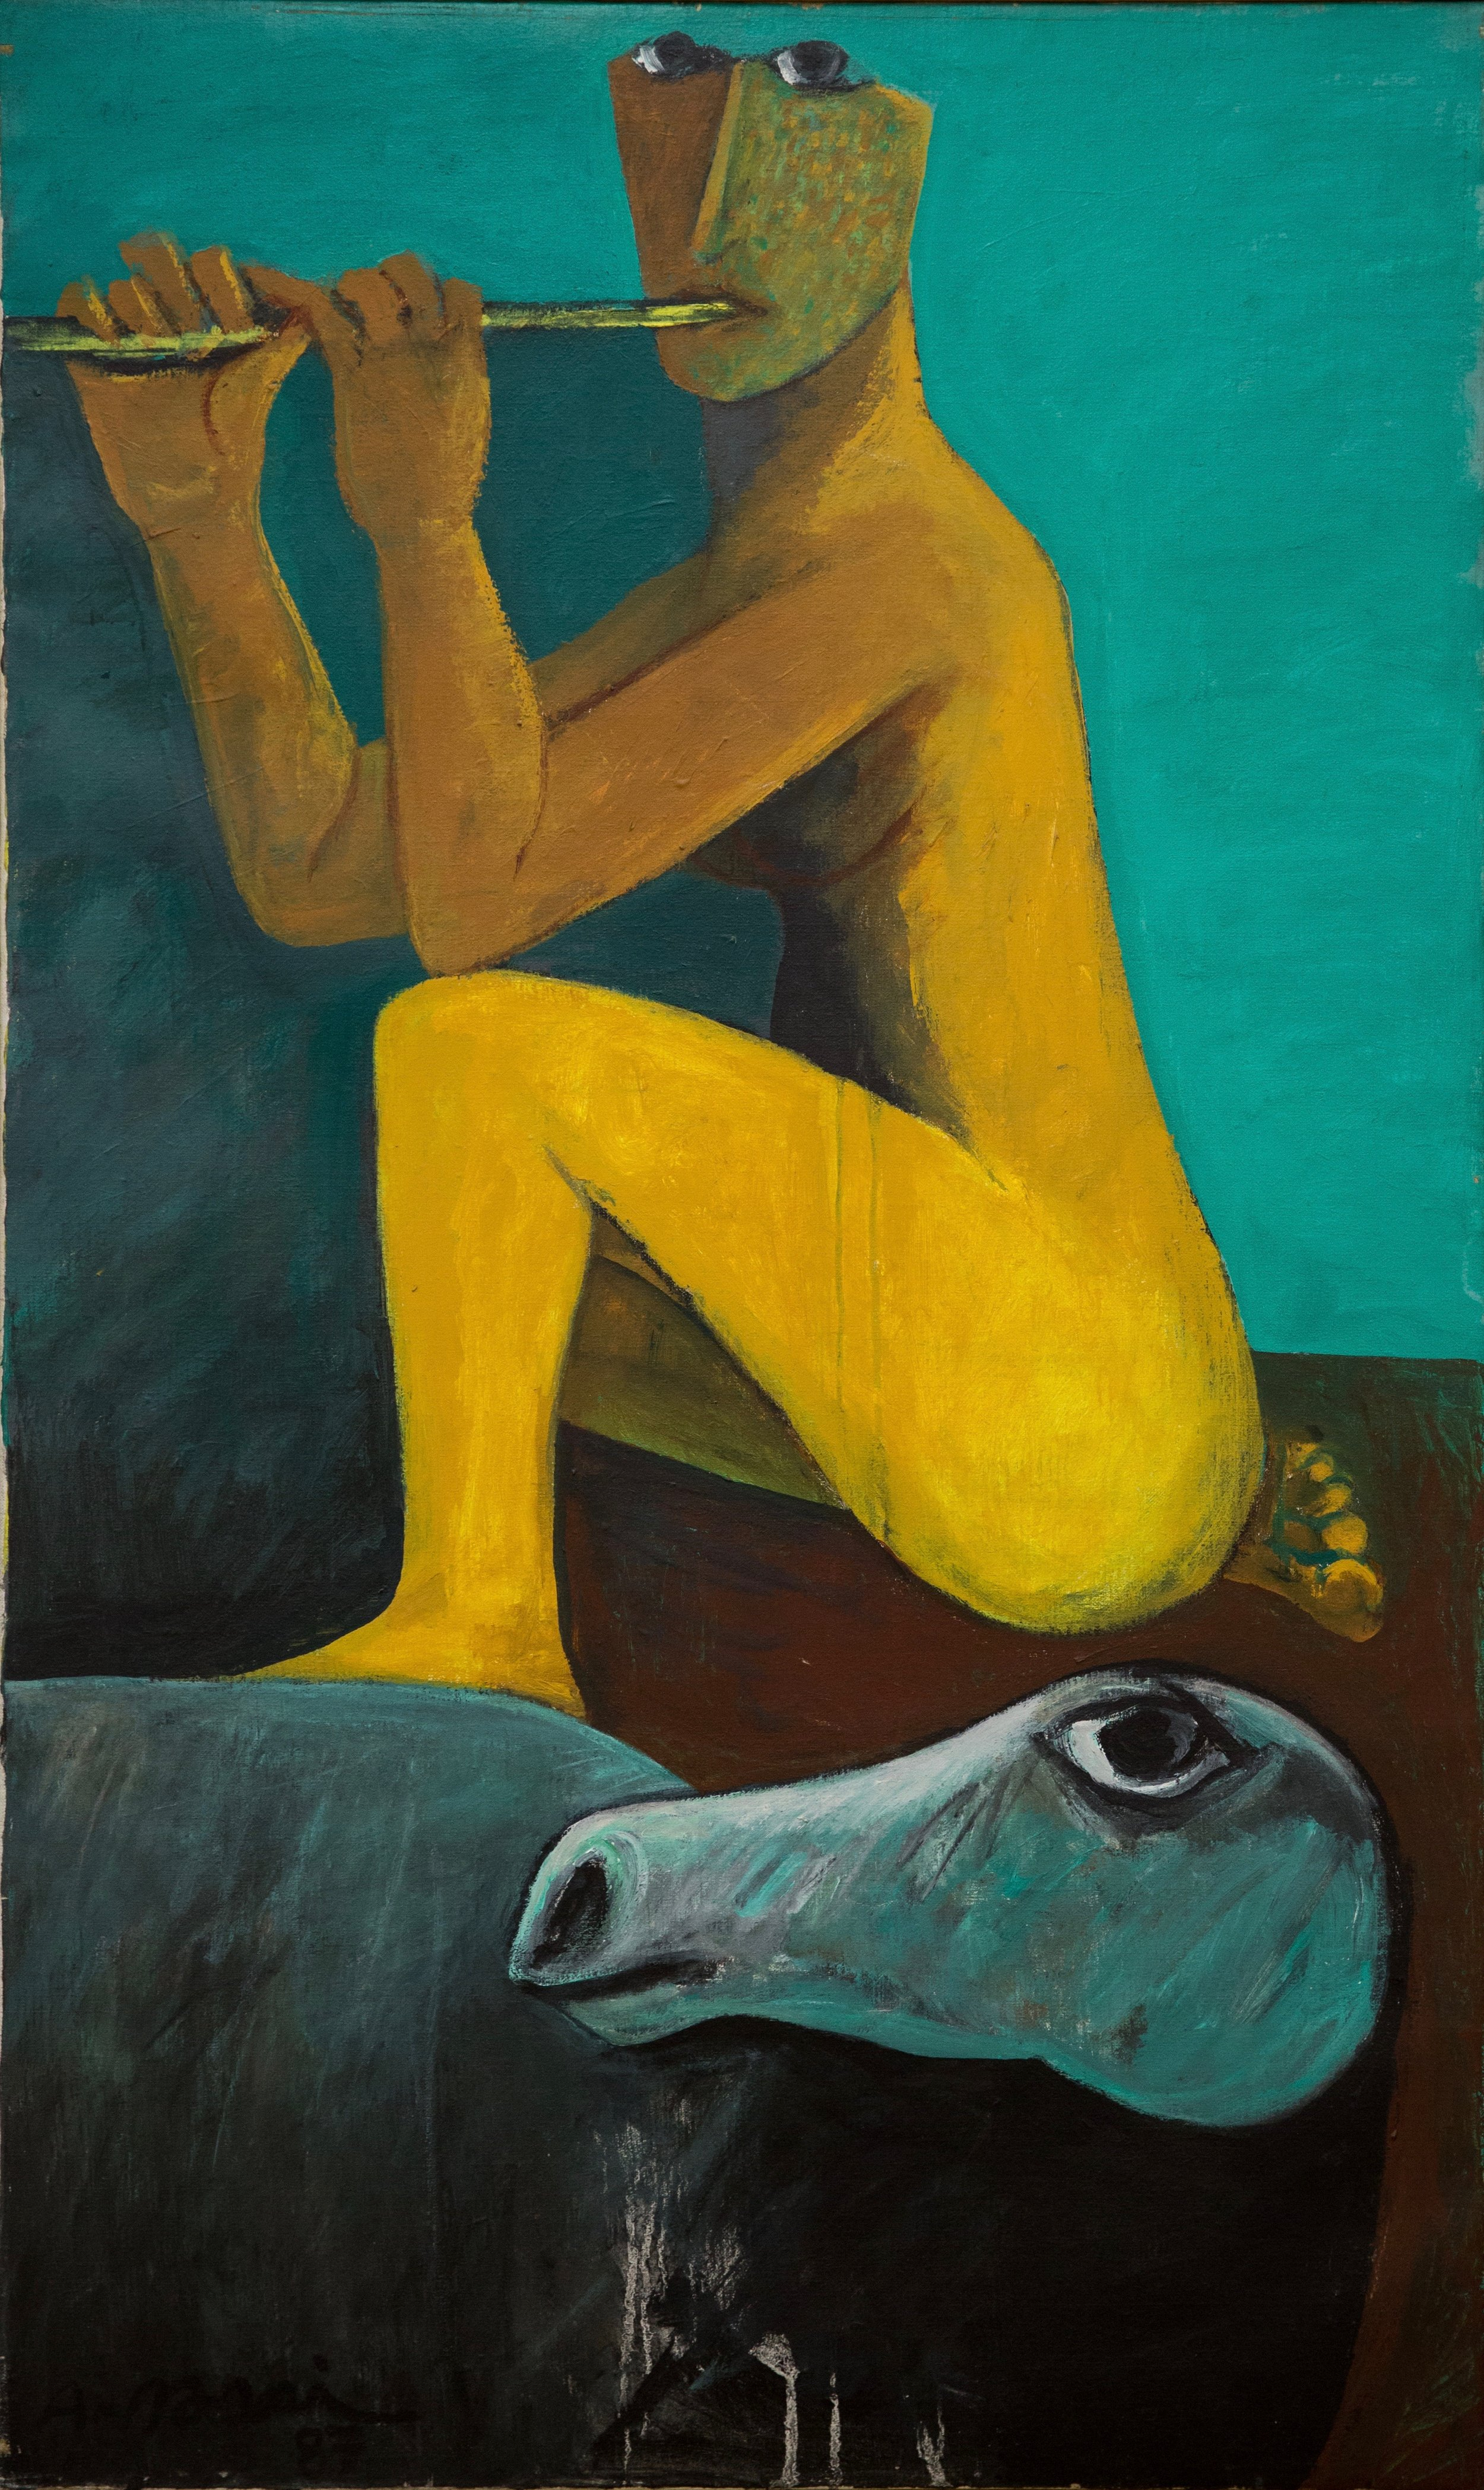 Ahmed-Morsi-Untitled-(Flute-Player)-1987.jpg